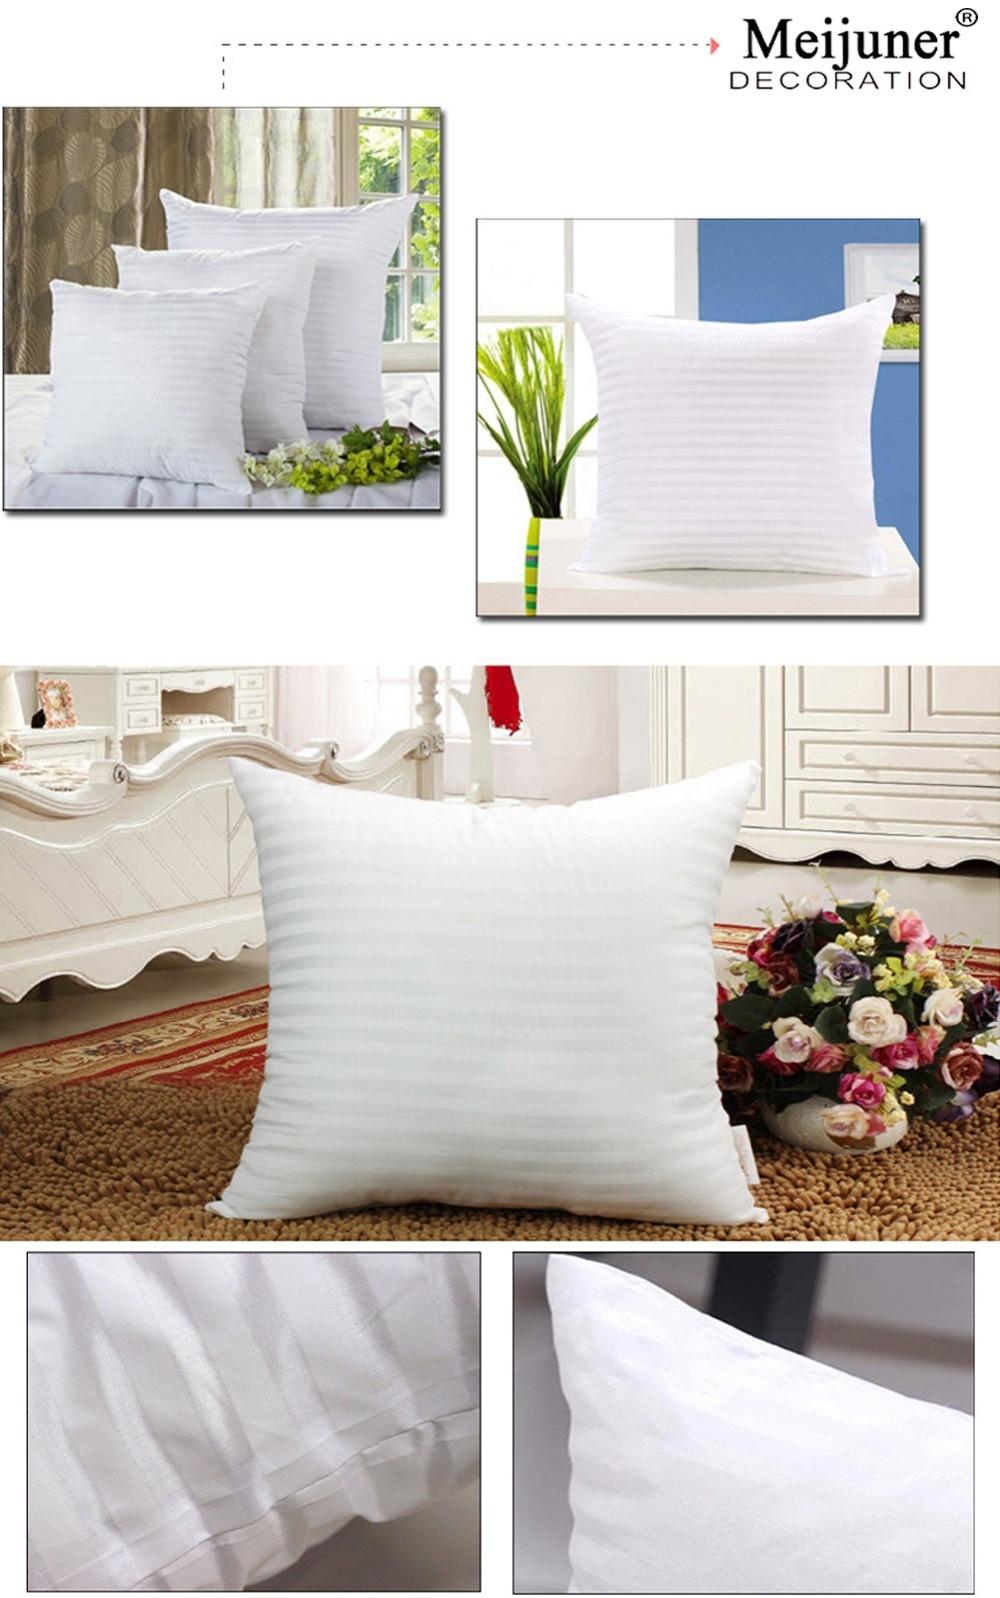 HTB1X2Qdcf1TBuNjy0Fjq6yjyXXaR Meijuner Square White Cushion Pillow interior Insert Soft PP Cotton for Home Decor Sofa Chair Throw Pillow Core Seat Cushion